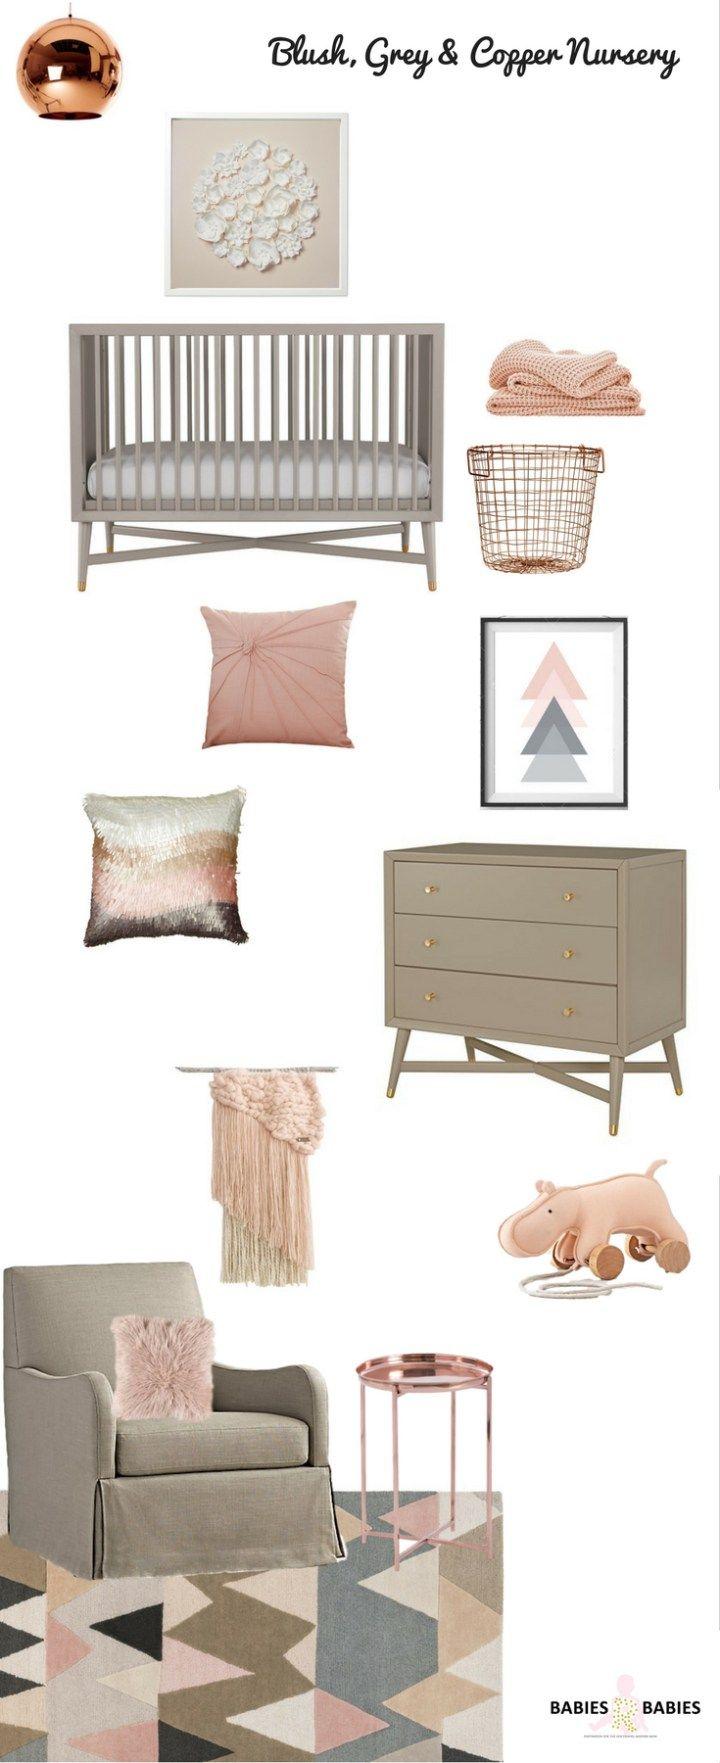 A blush grey and copper nursery design, nursery design inspiration,mid century nursery